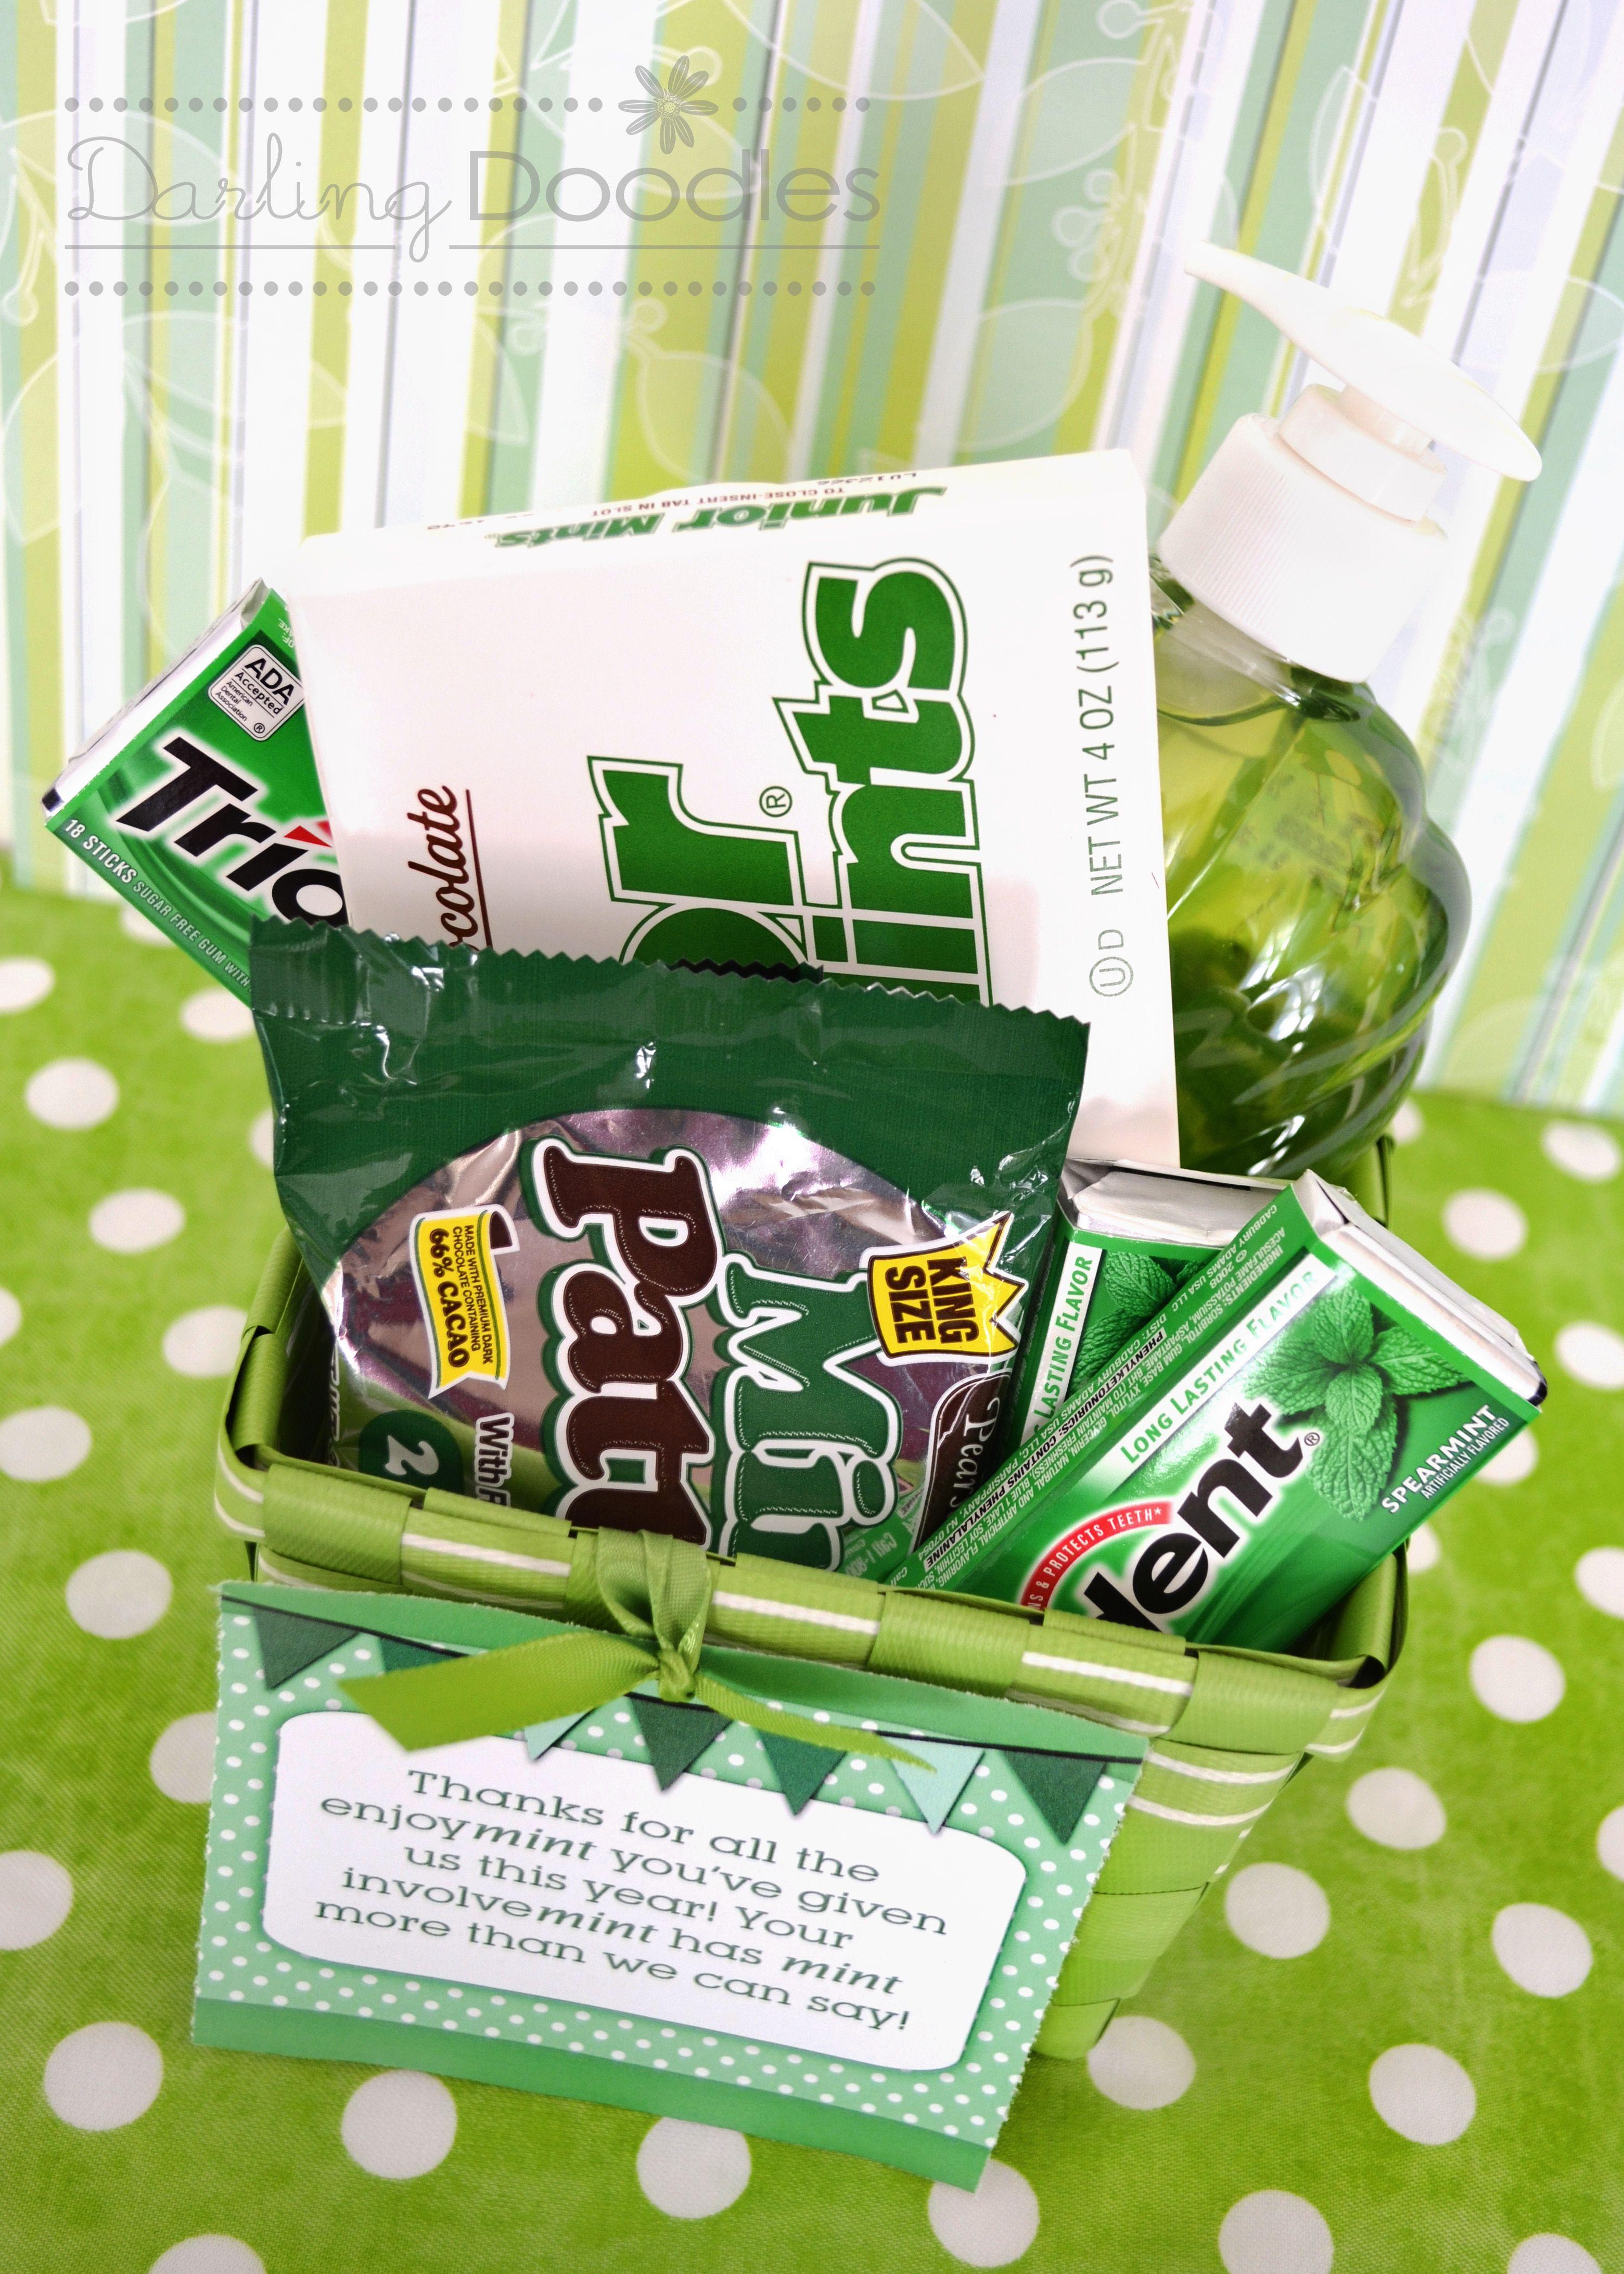 Mint gift basket idea from darling doodles gift ideas pinterest mint gift basket idea from darling doodles negle Images